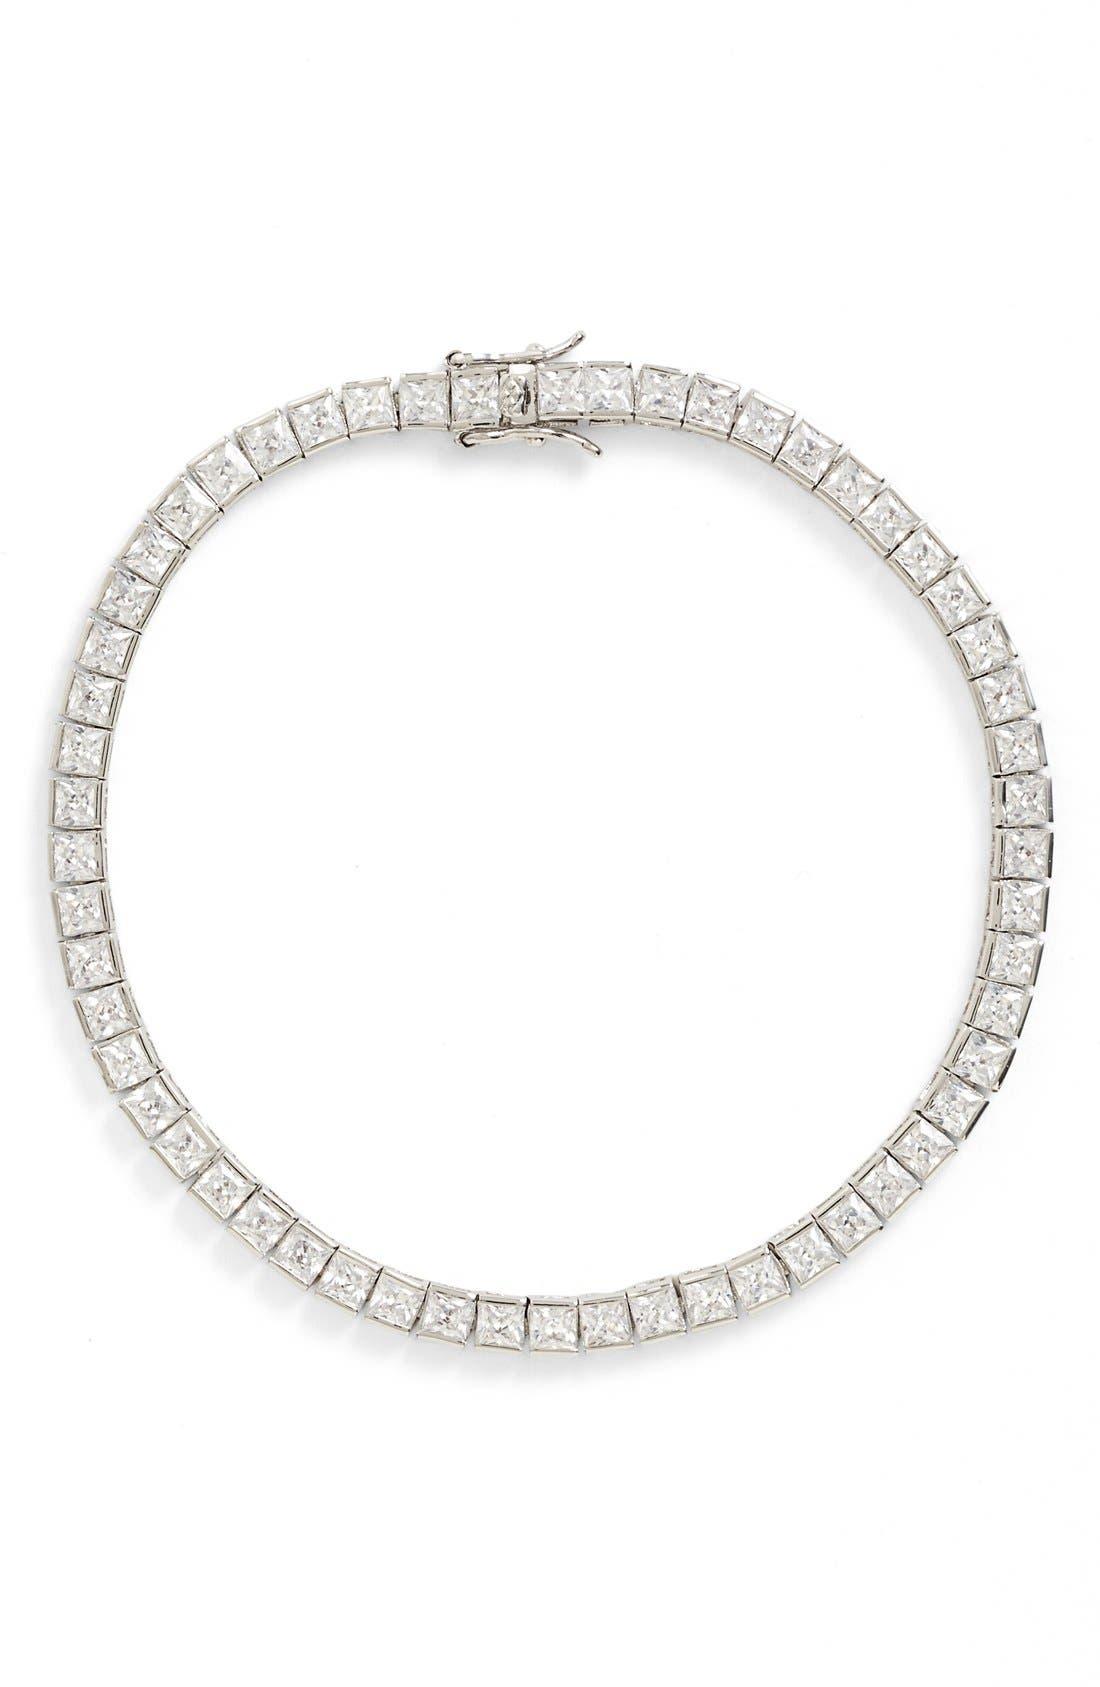 Main Image - Nina Cubic Zirconia Tennis Bracelet